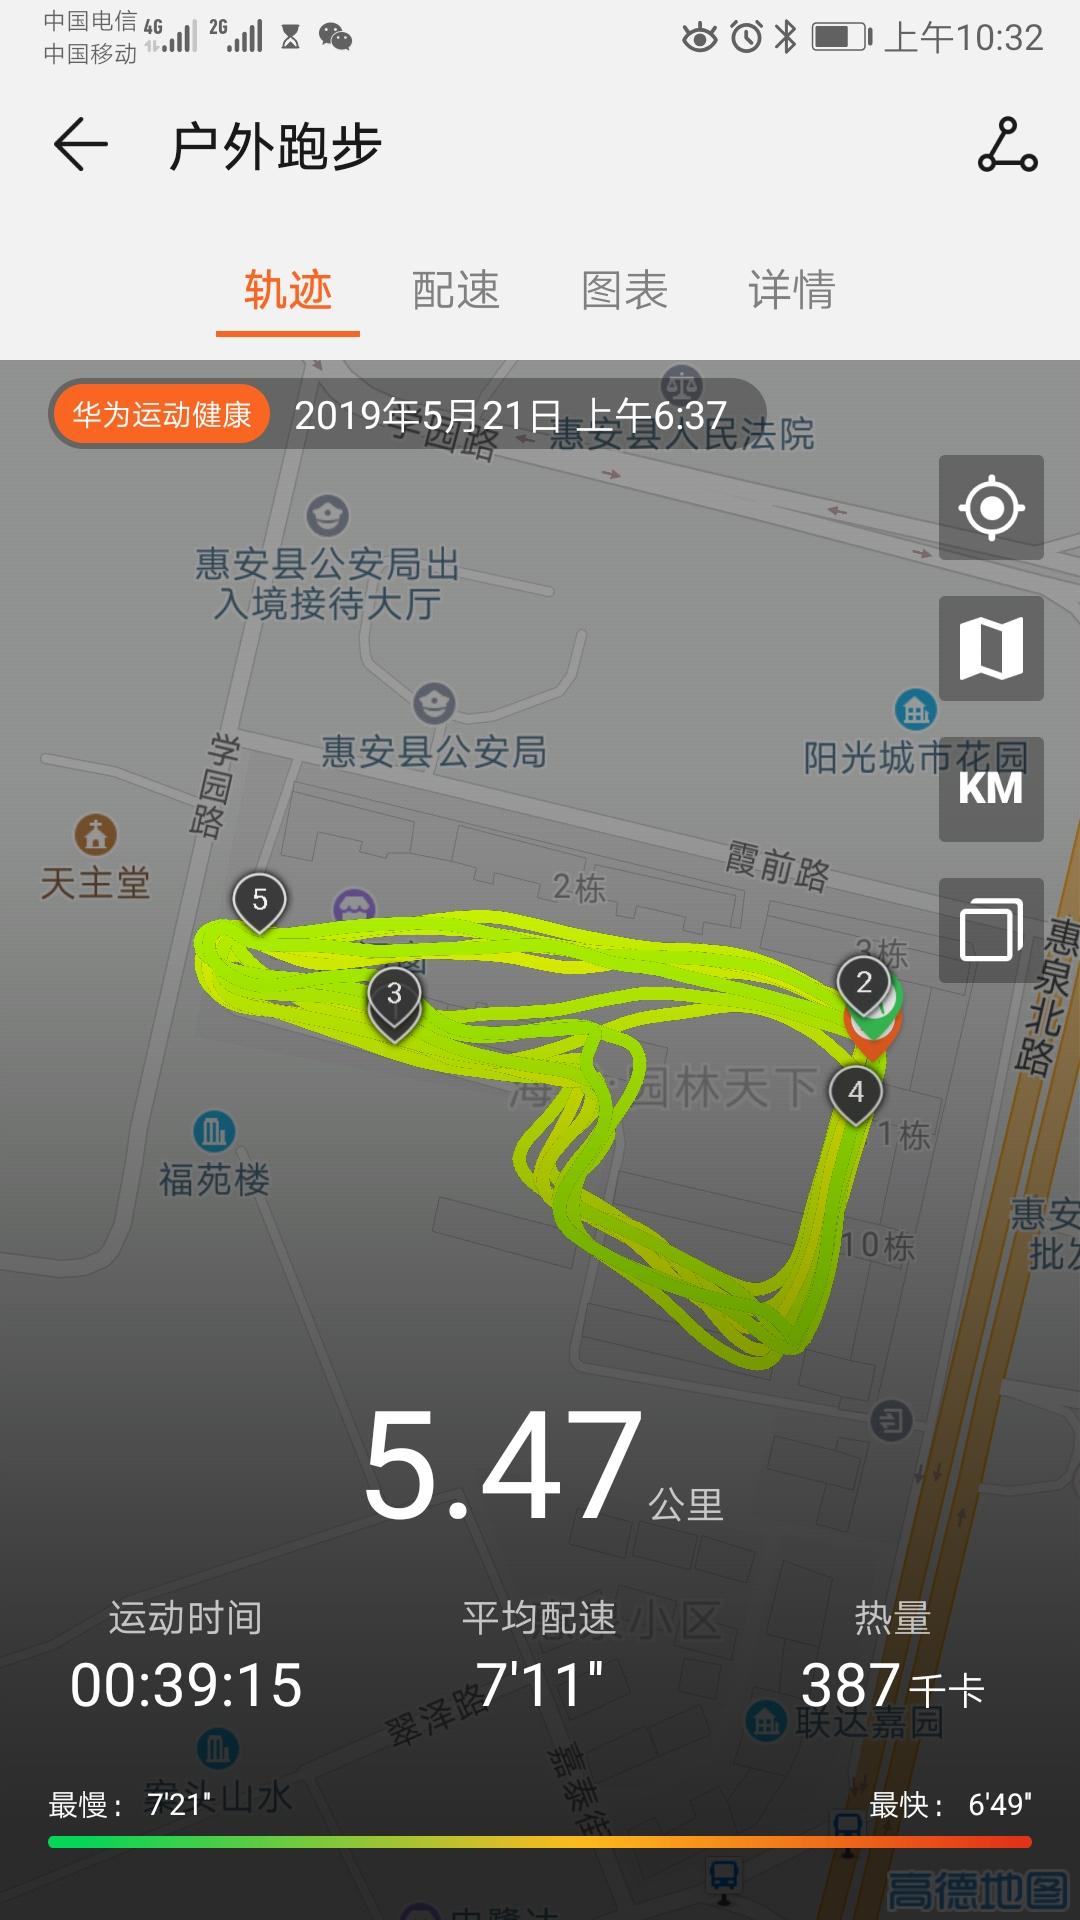 Screenshot_20190521_103208_com.huawei.health.jpg